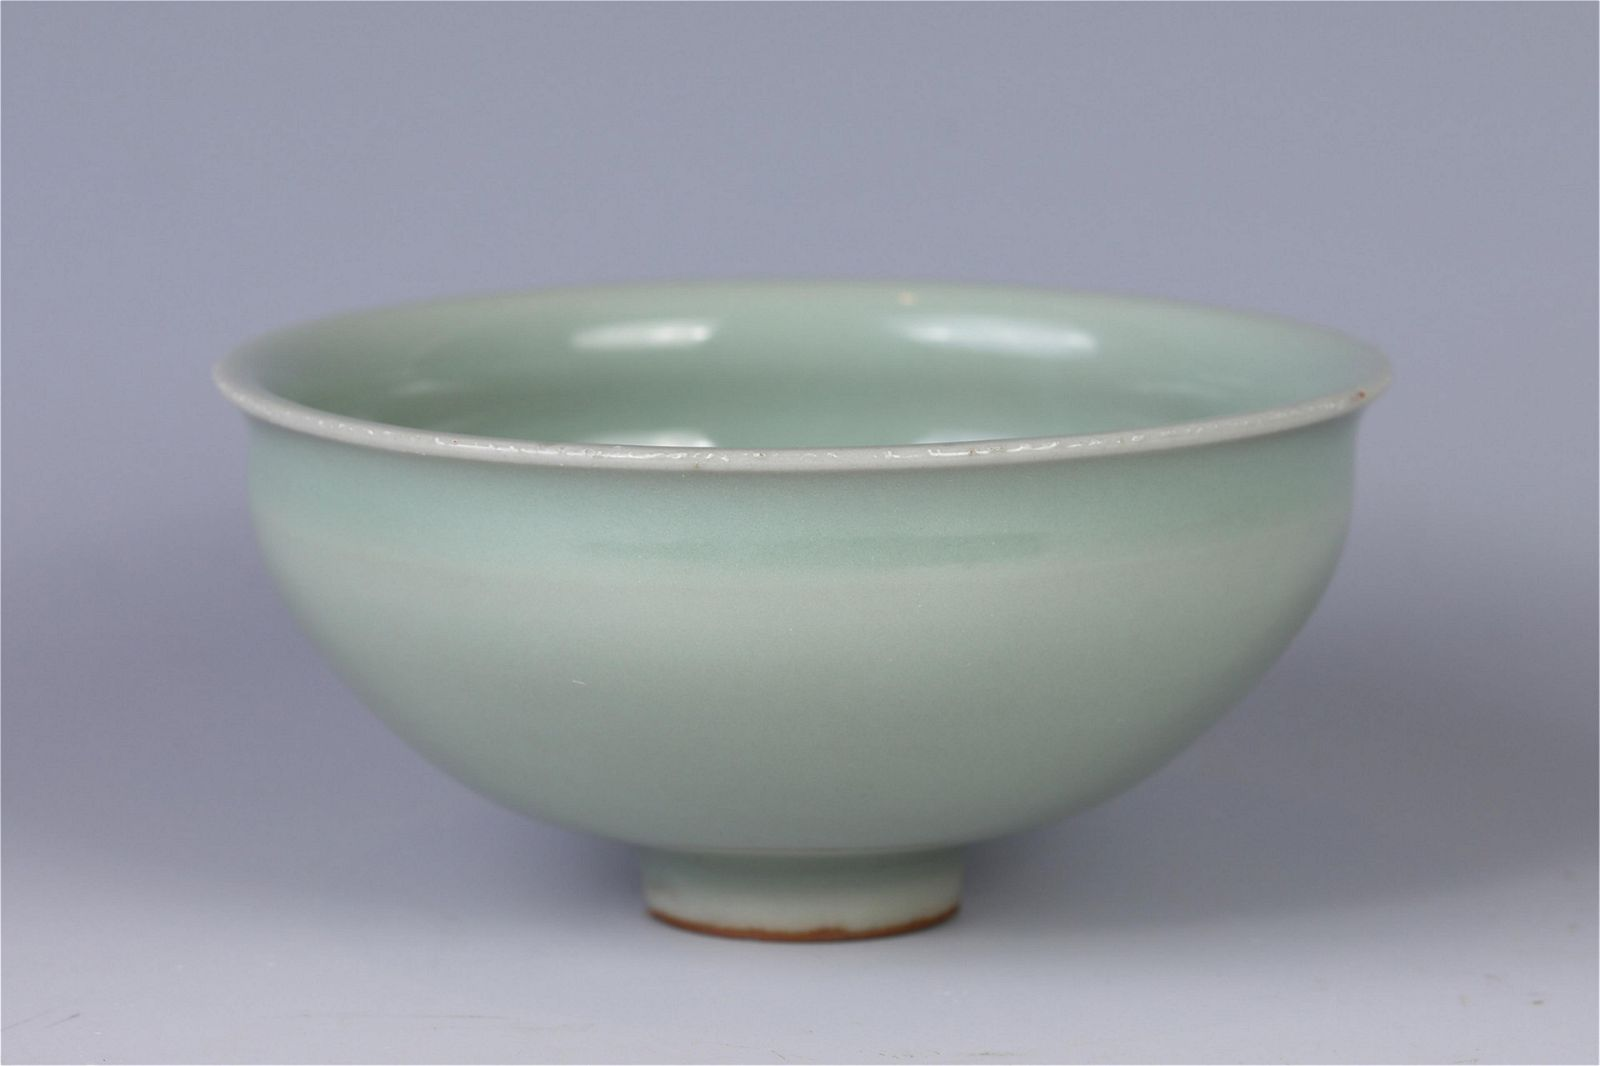 A CHINESE CELADON GLAZED PORCELAIN BOWL